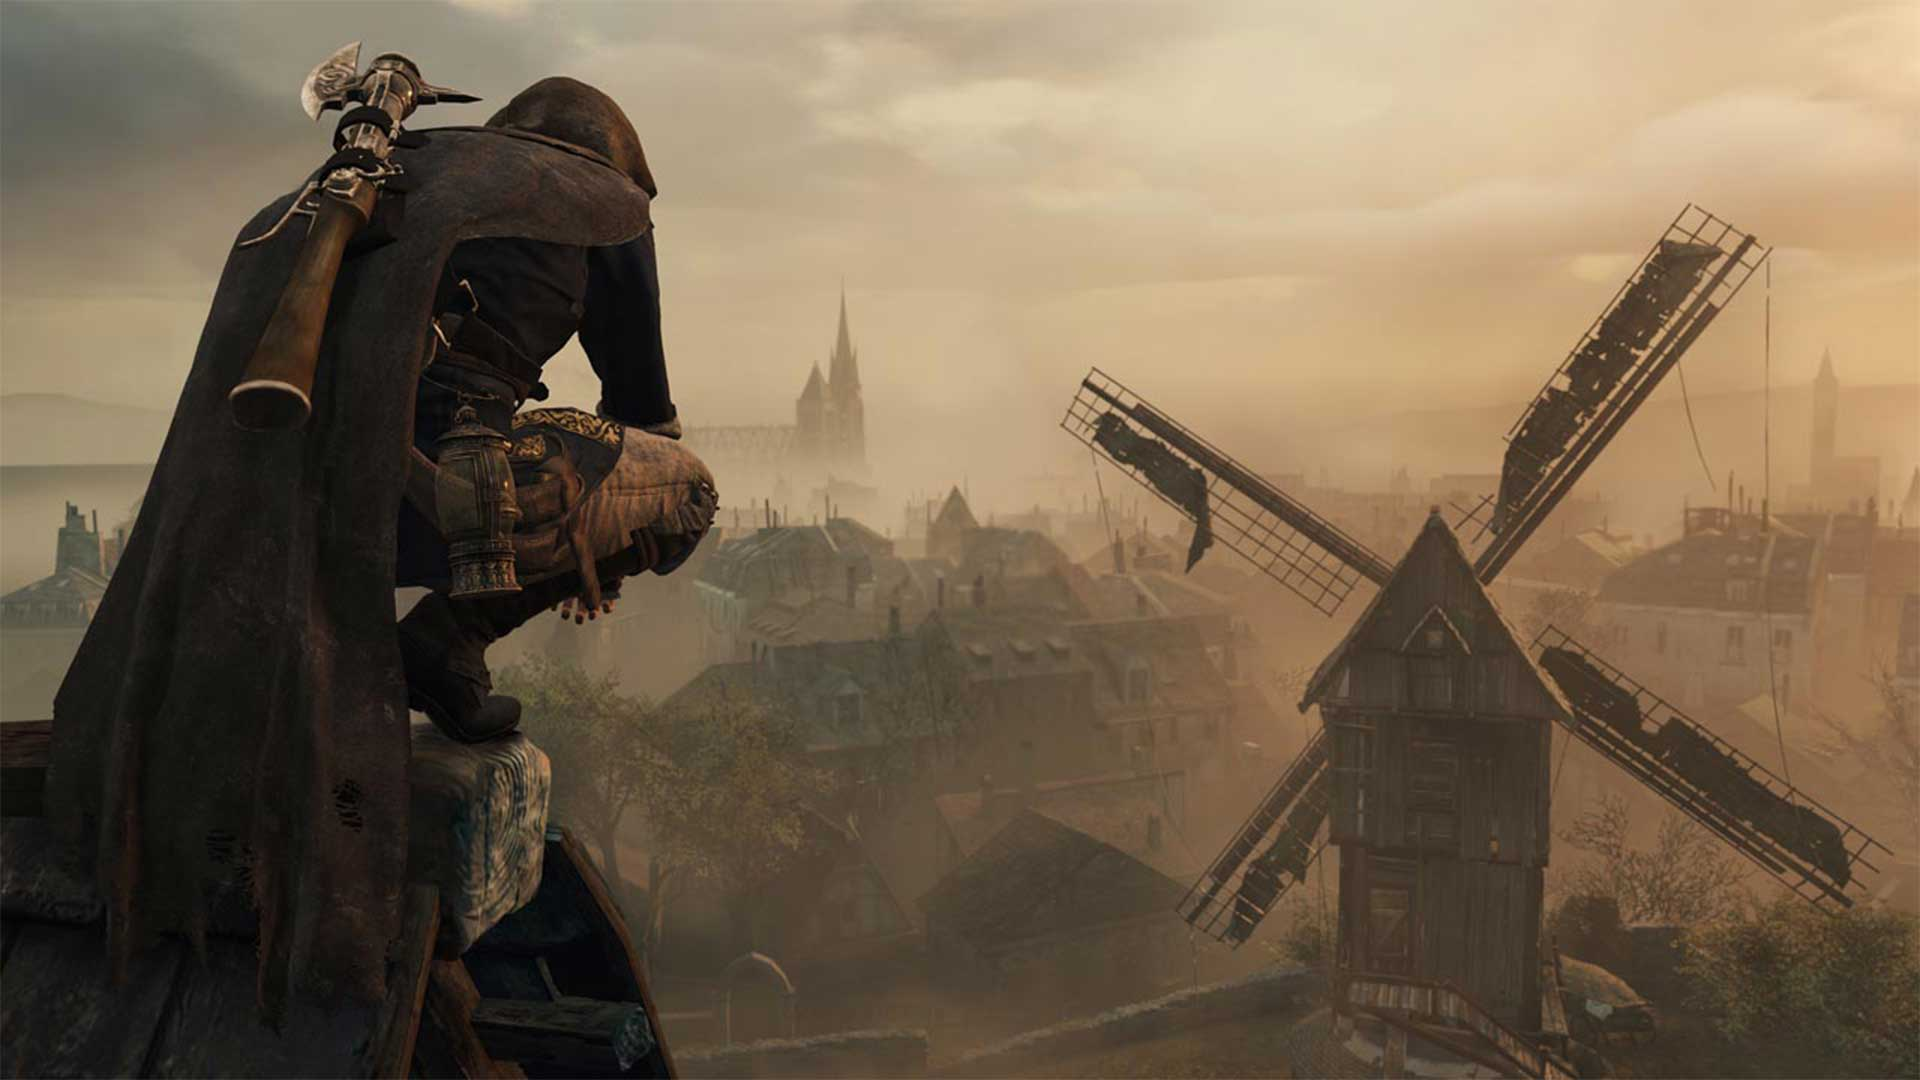 Руководство по загадке Нострадамуса в игре Assassin's Creed Unity (Стрелец)